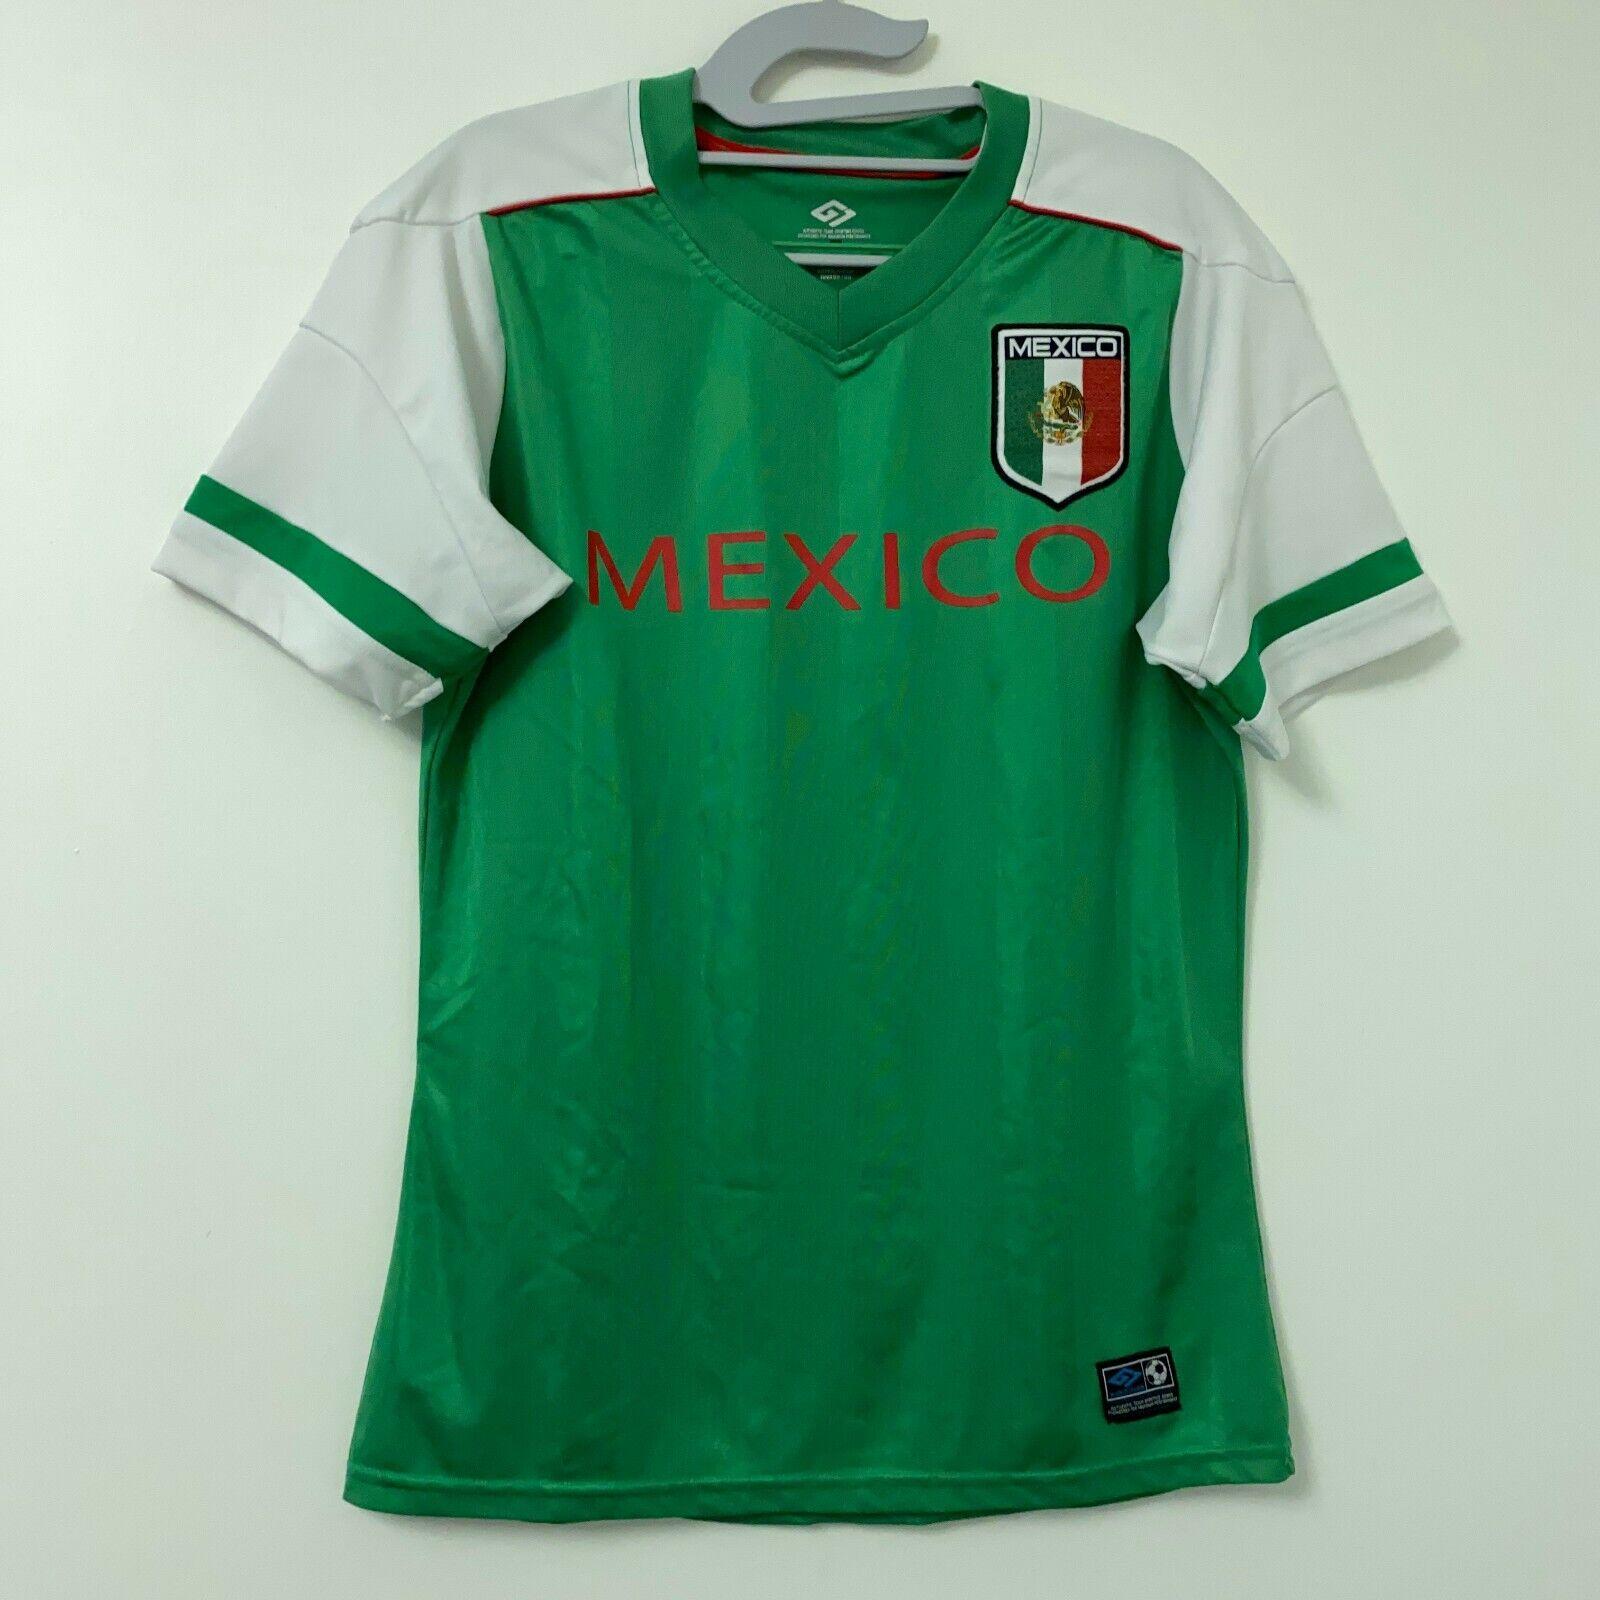 umbro mexico jersey